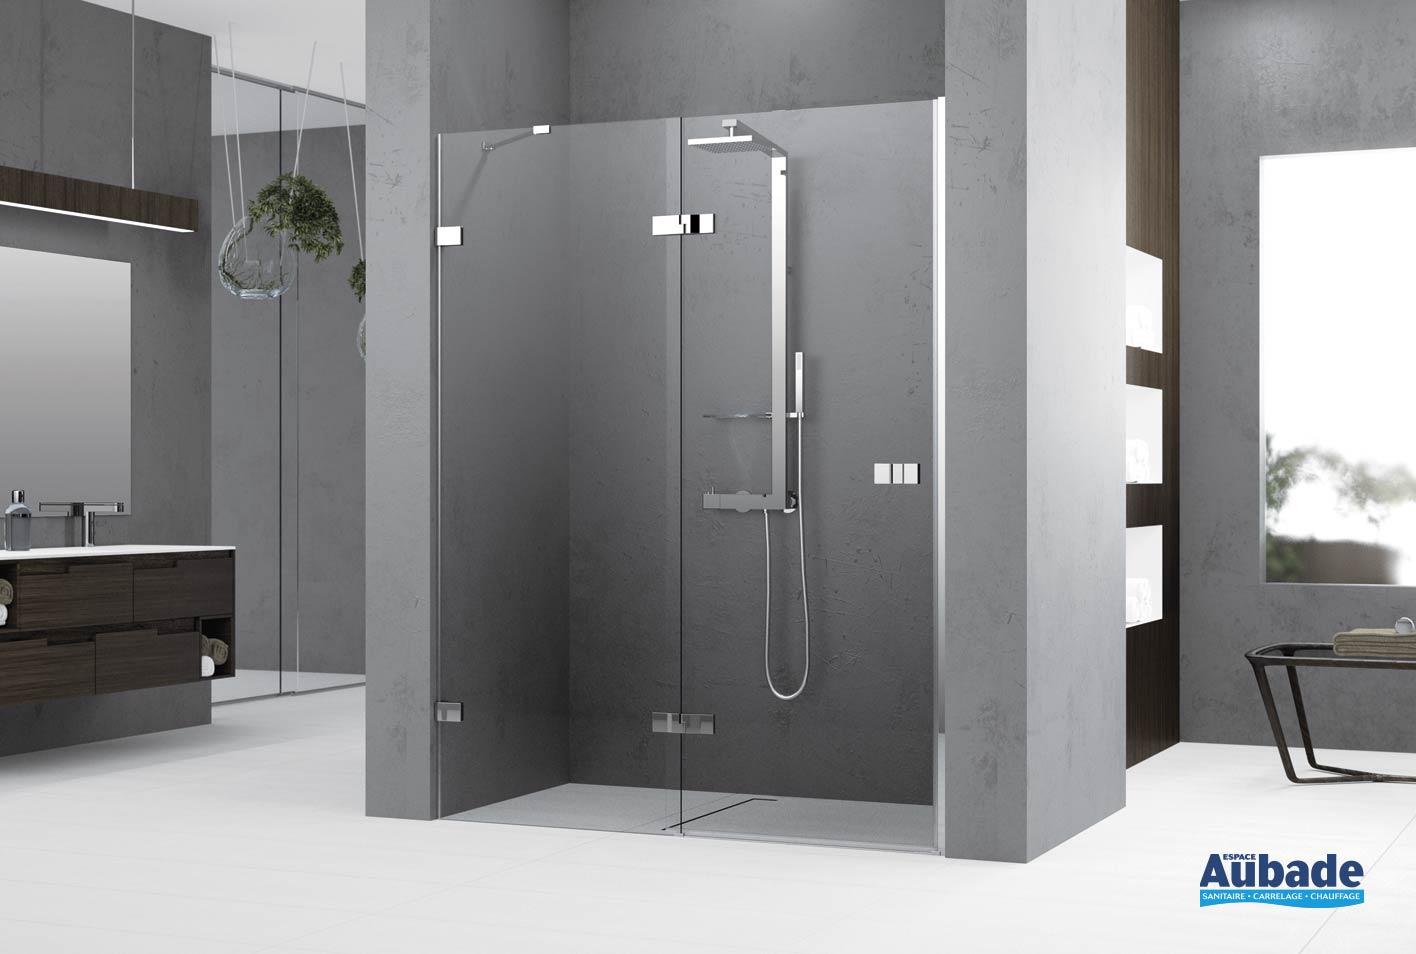 parois de douche gala novellini espace aubade. Black Bedroom Furniture Sets. Home Design Ideas